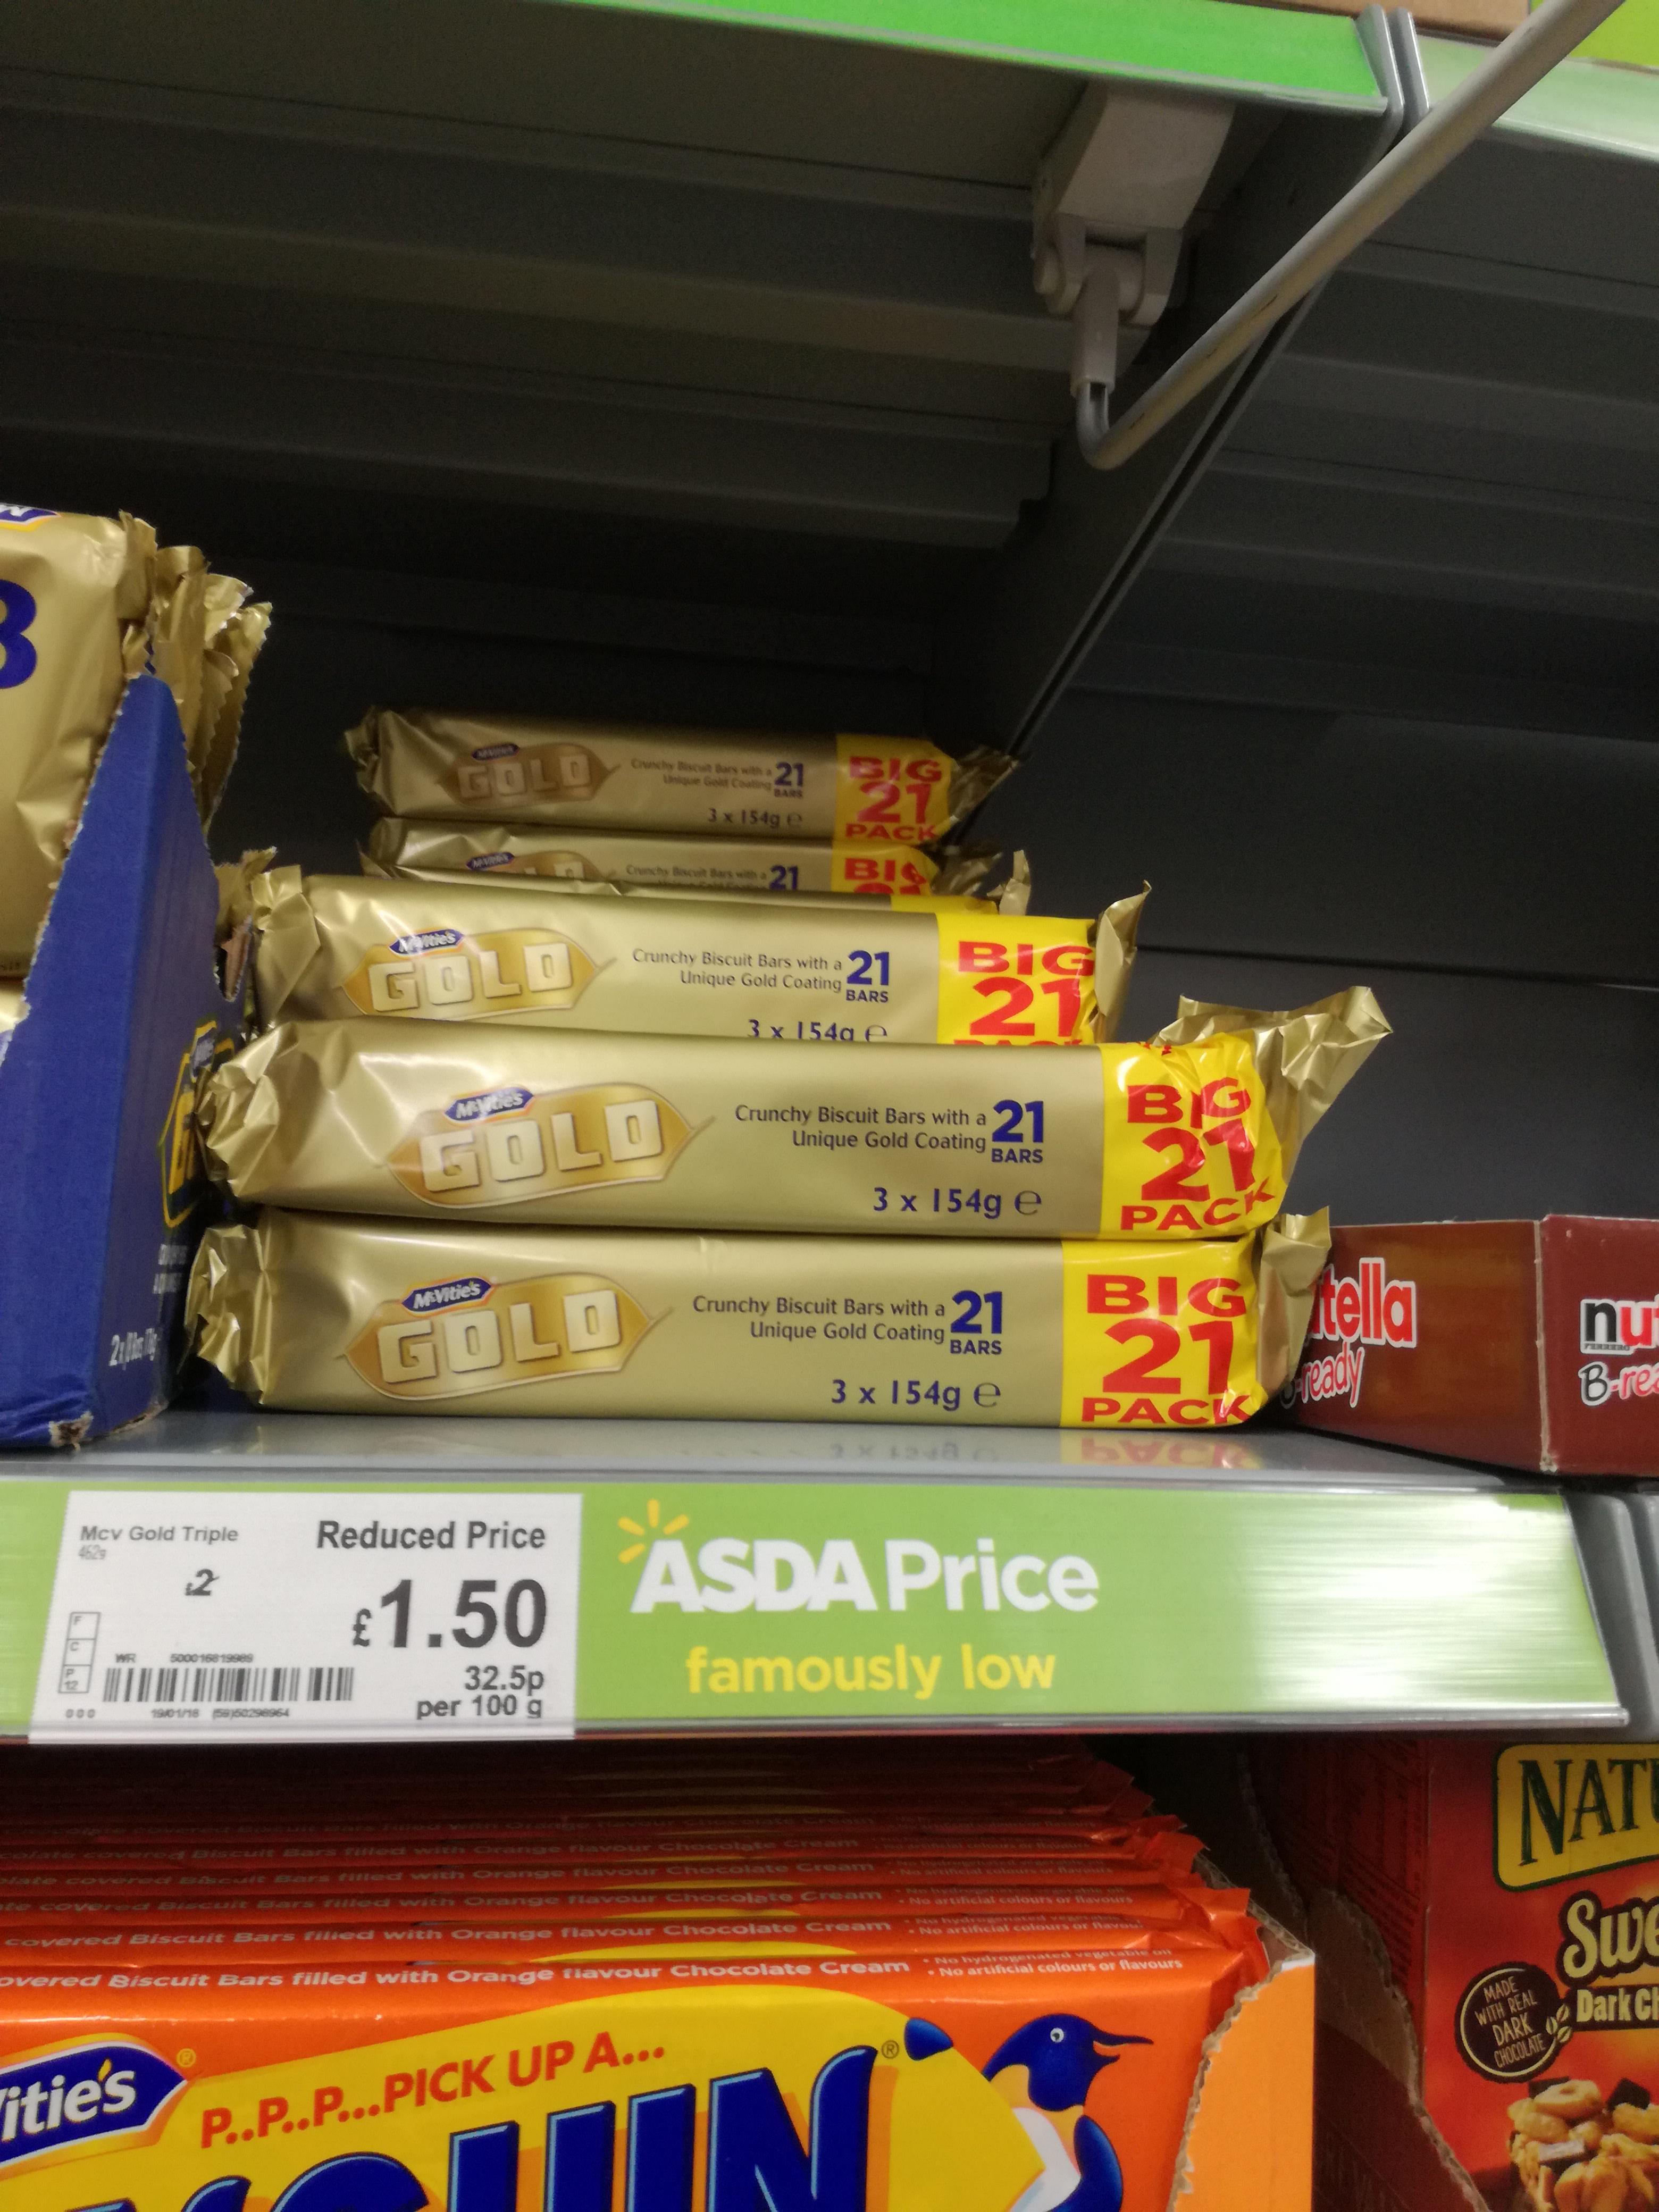 Gold Bars 21 pack £1.50 Asda